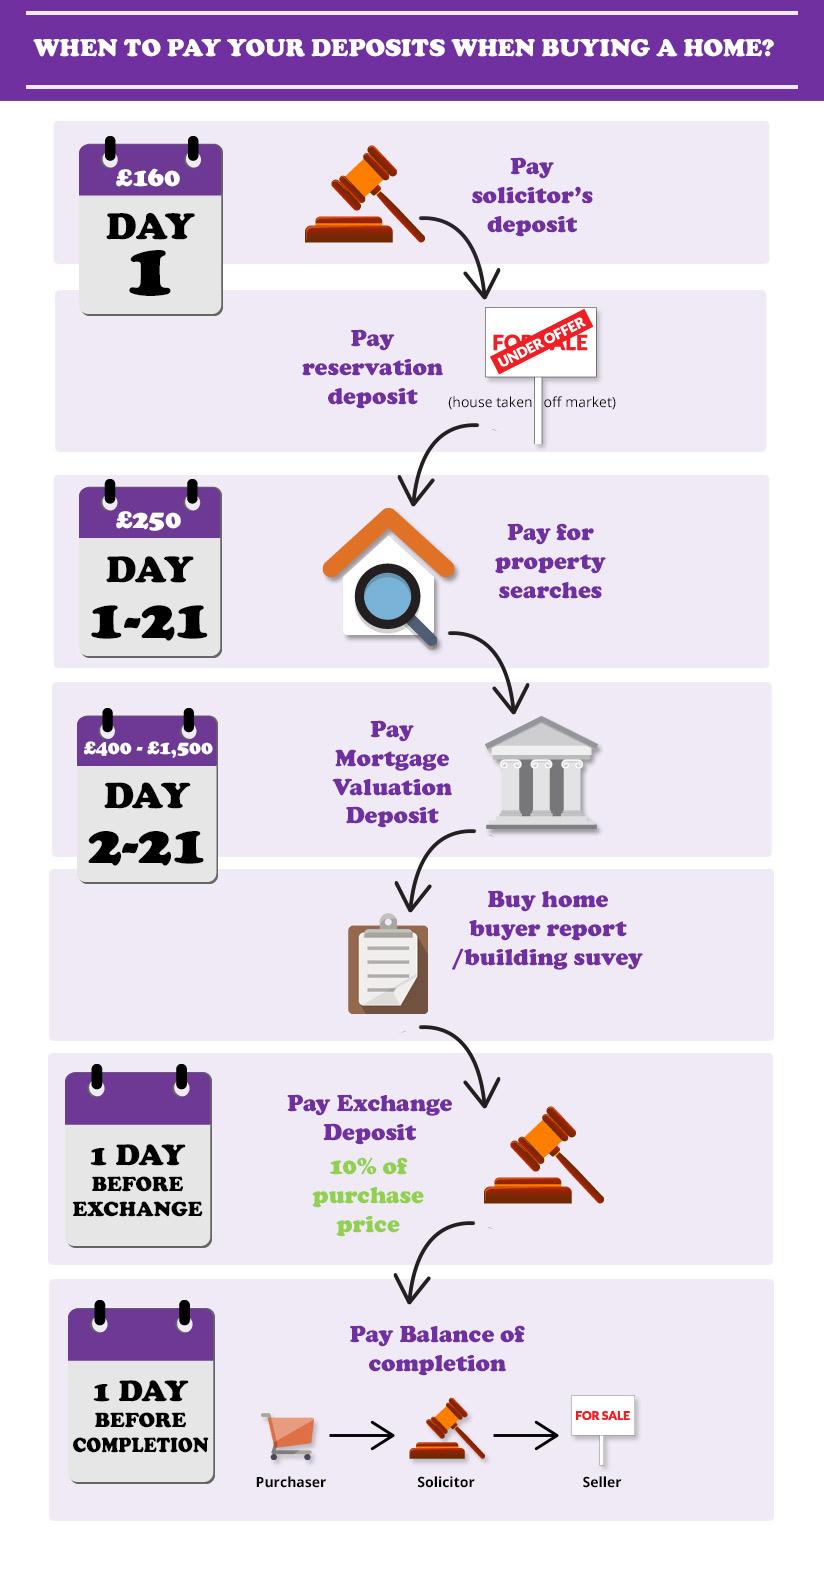 Wondrous When Do You Pay Your House Deposit Interior Design Ideas Lukepblogthenellocom